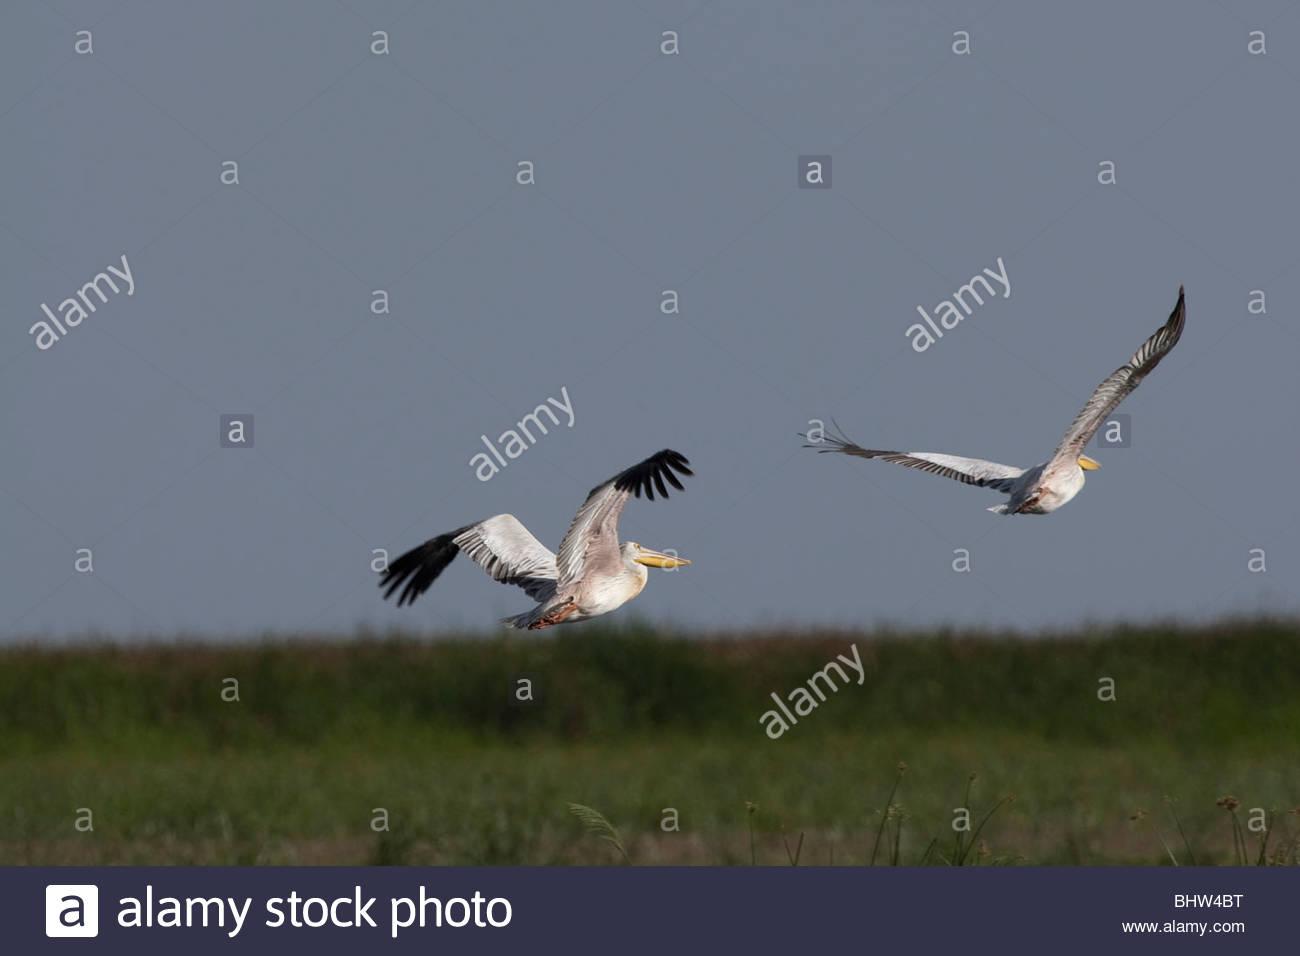 Two Great White Pelicans flying at Lake Manyara National Park, Tanzania - Stock Image